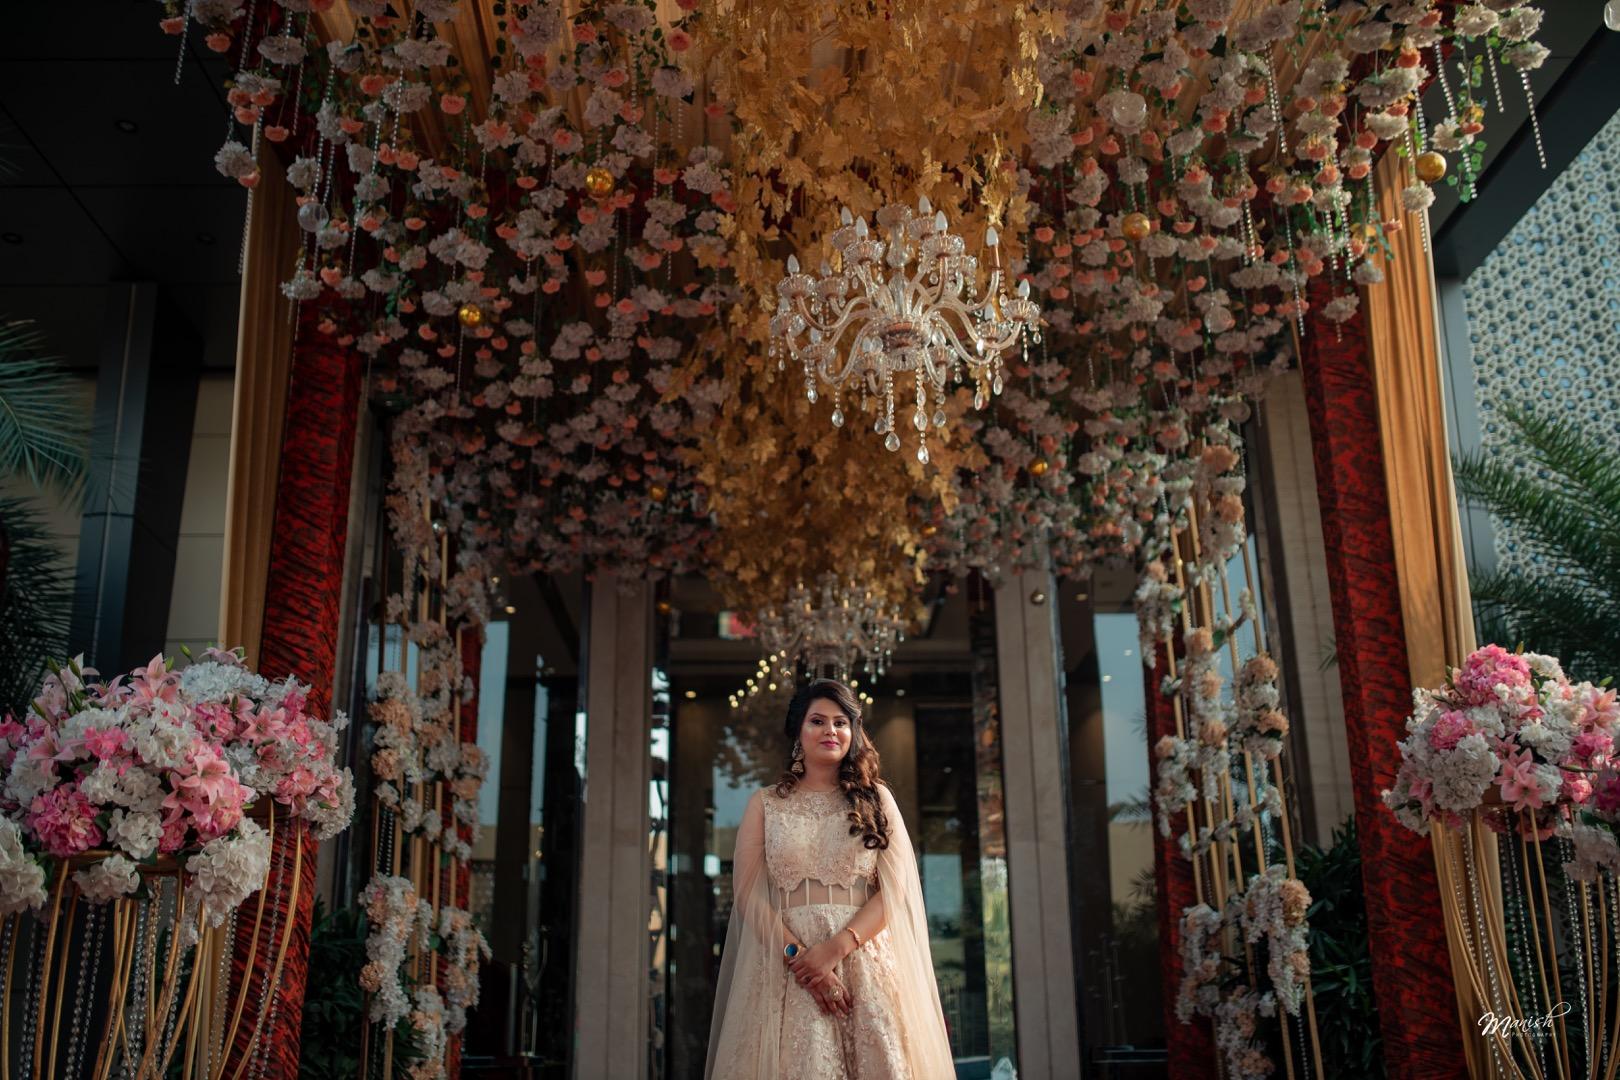 Wedding Floral Decor Ideas